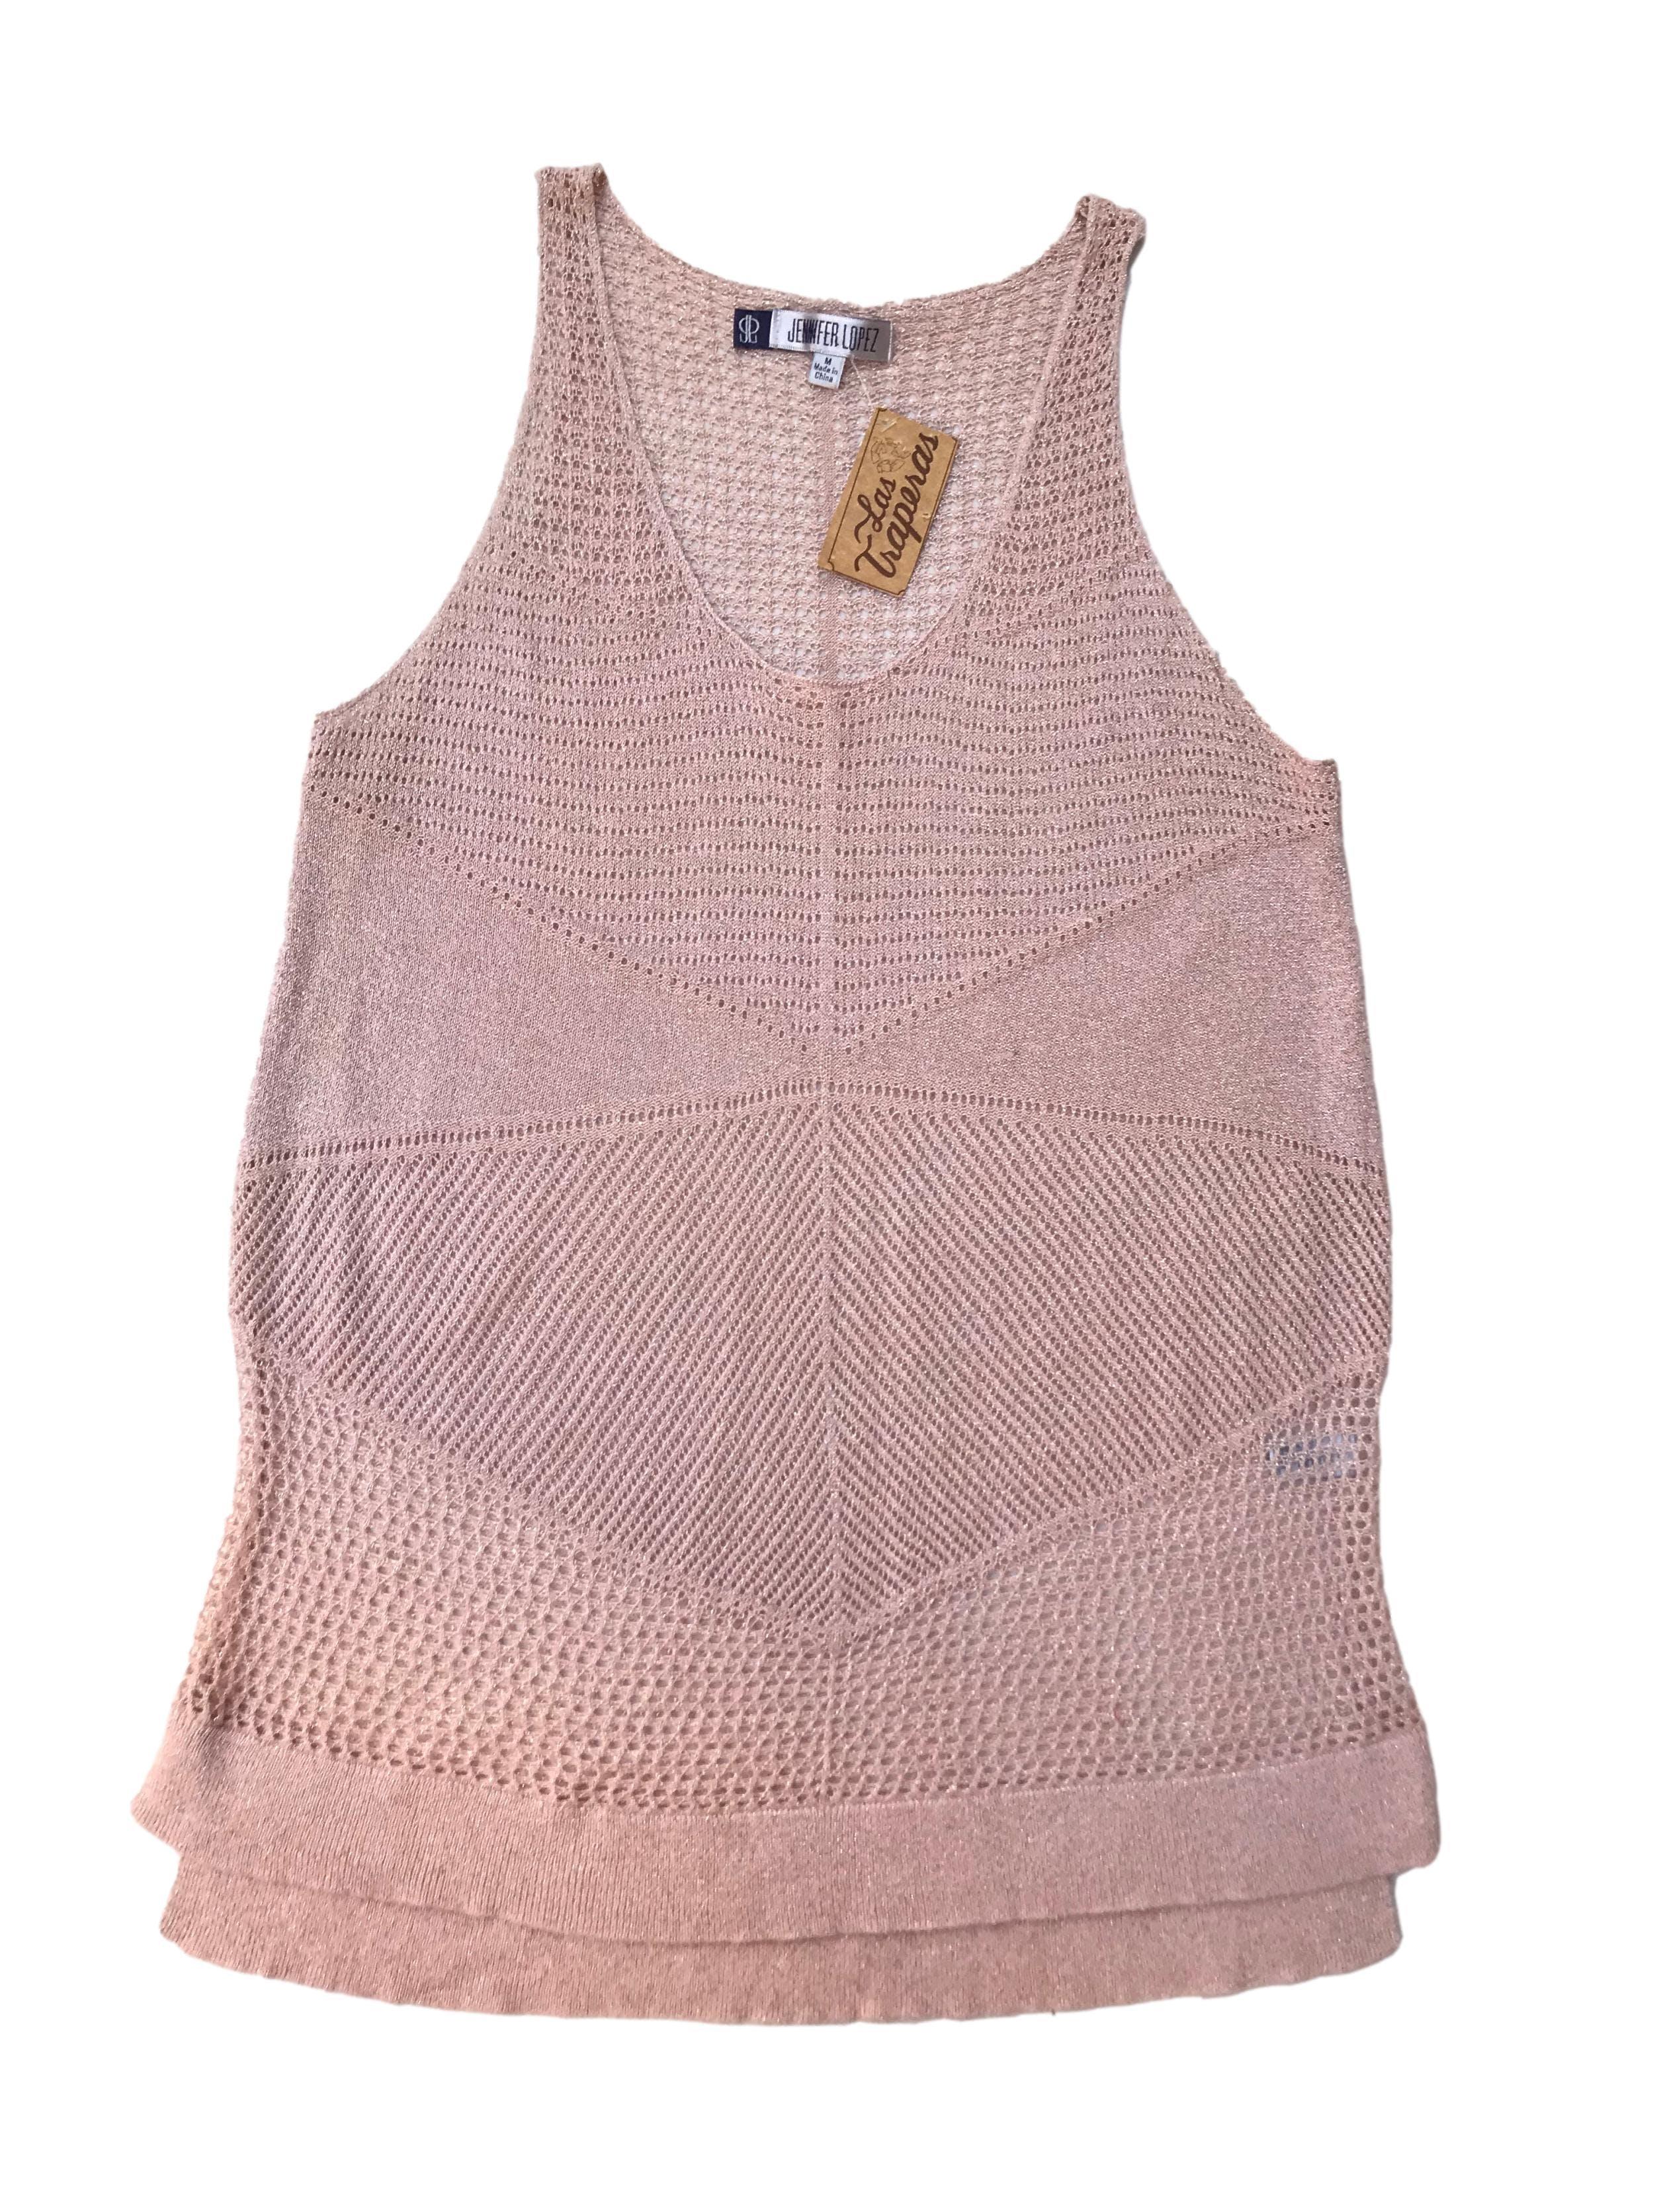 Polo Jennifer Lopez tejido calado palo rosa con hilos dorados. Largo 65 - 70cm